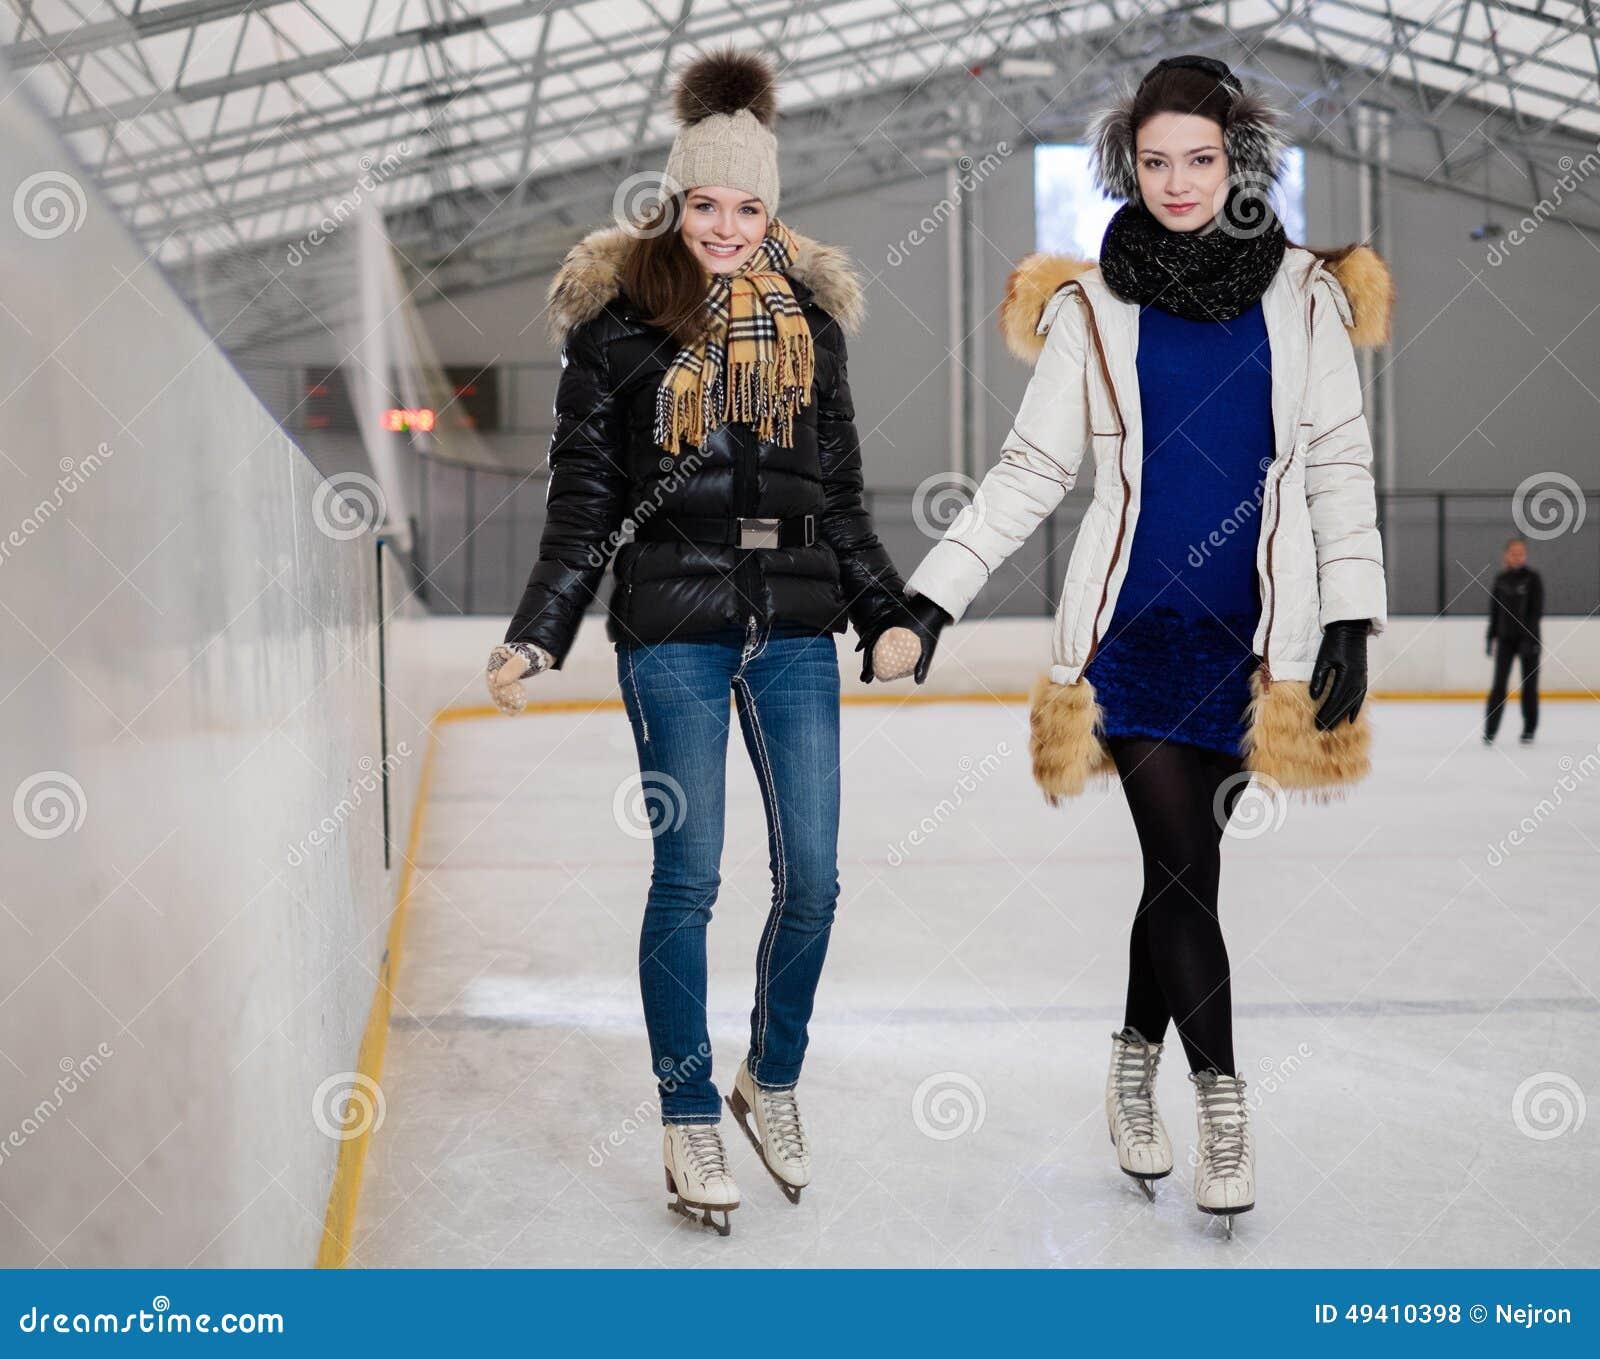 girls on iceskating rink stock photo image of positive